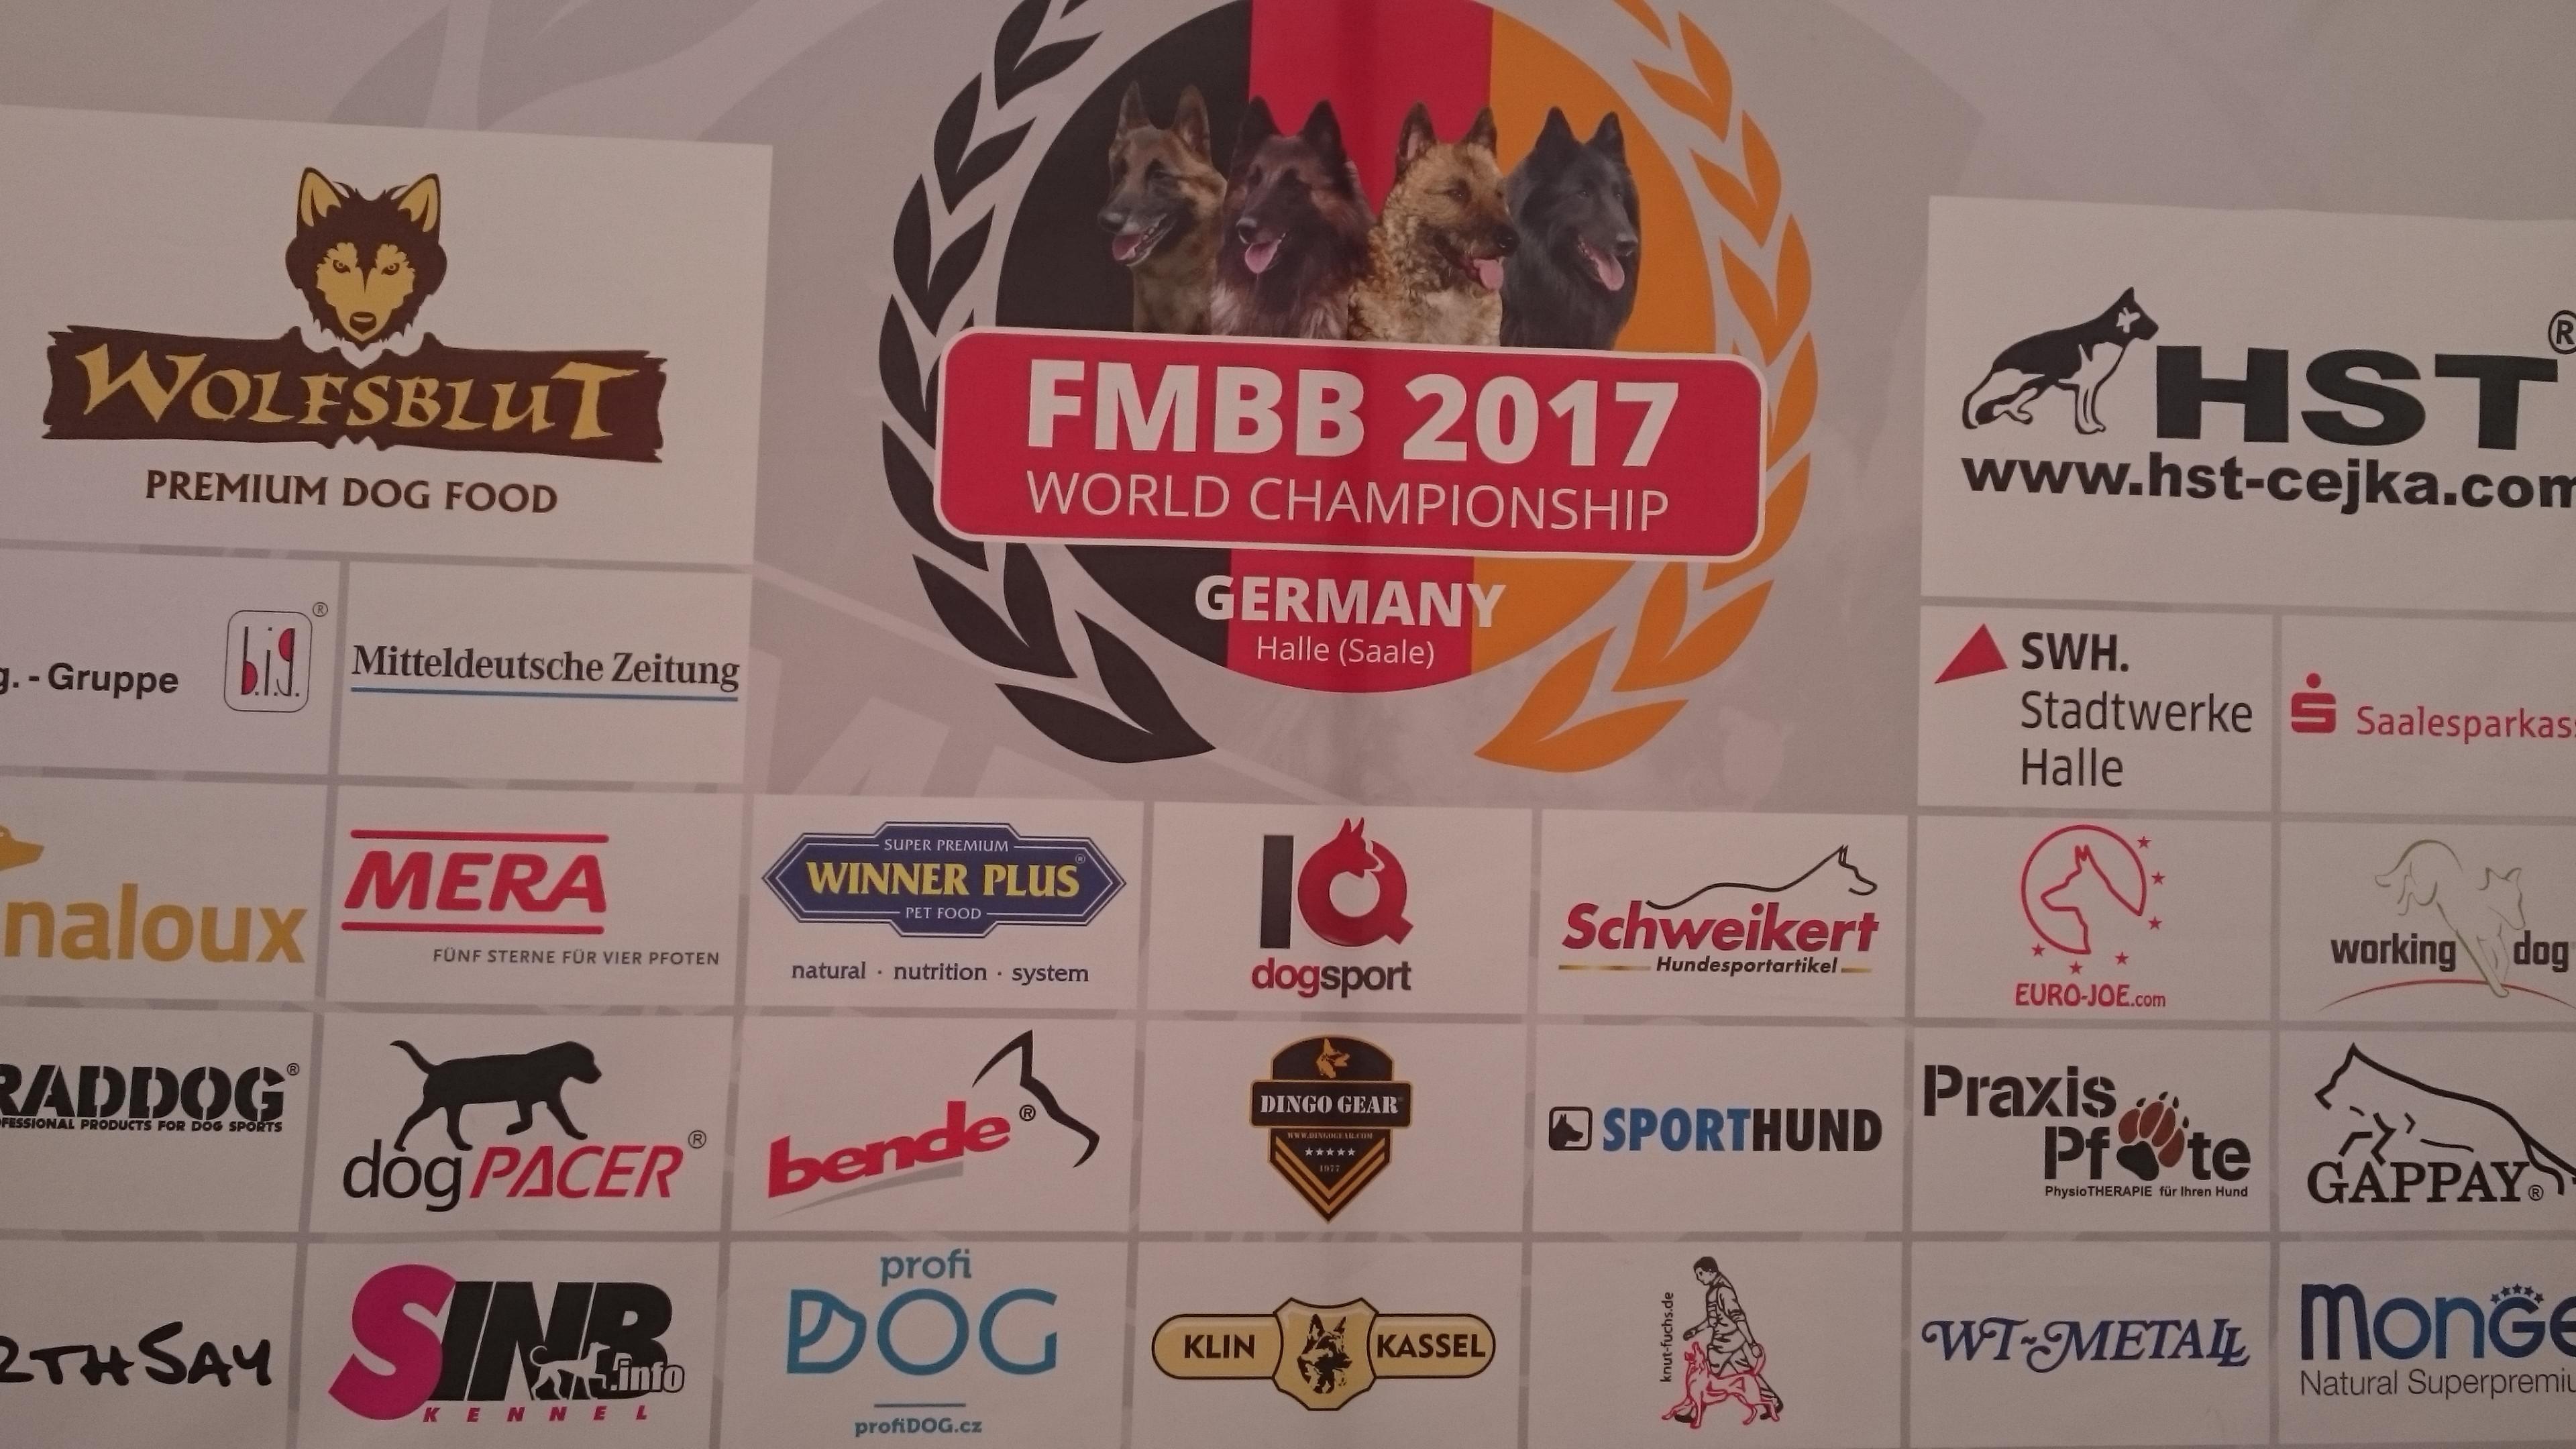 FMBB WORLD CHAMPOINSHIP 2017   Halle Saale